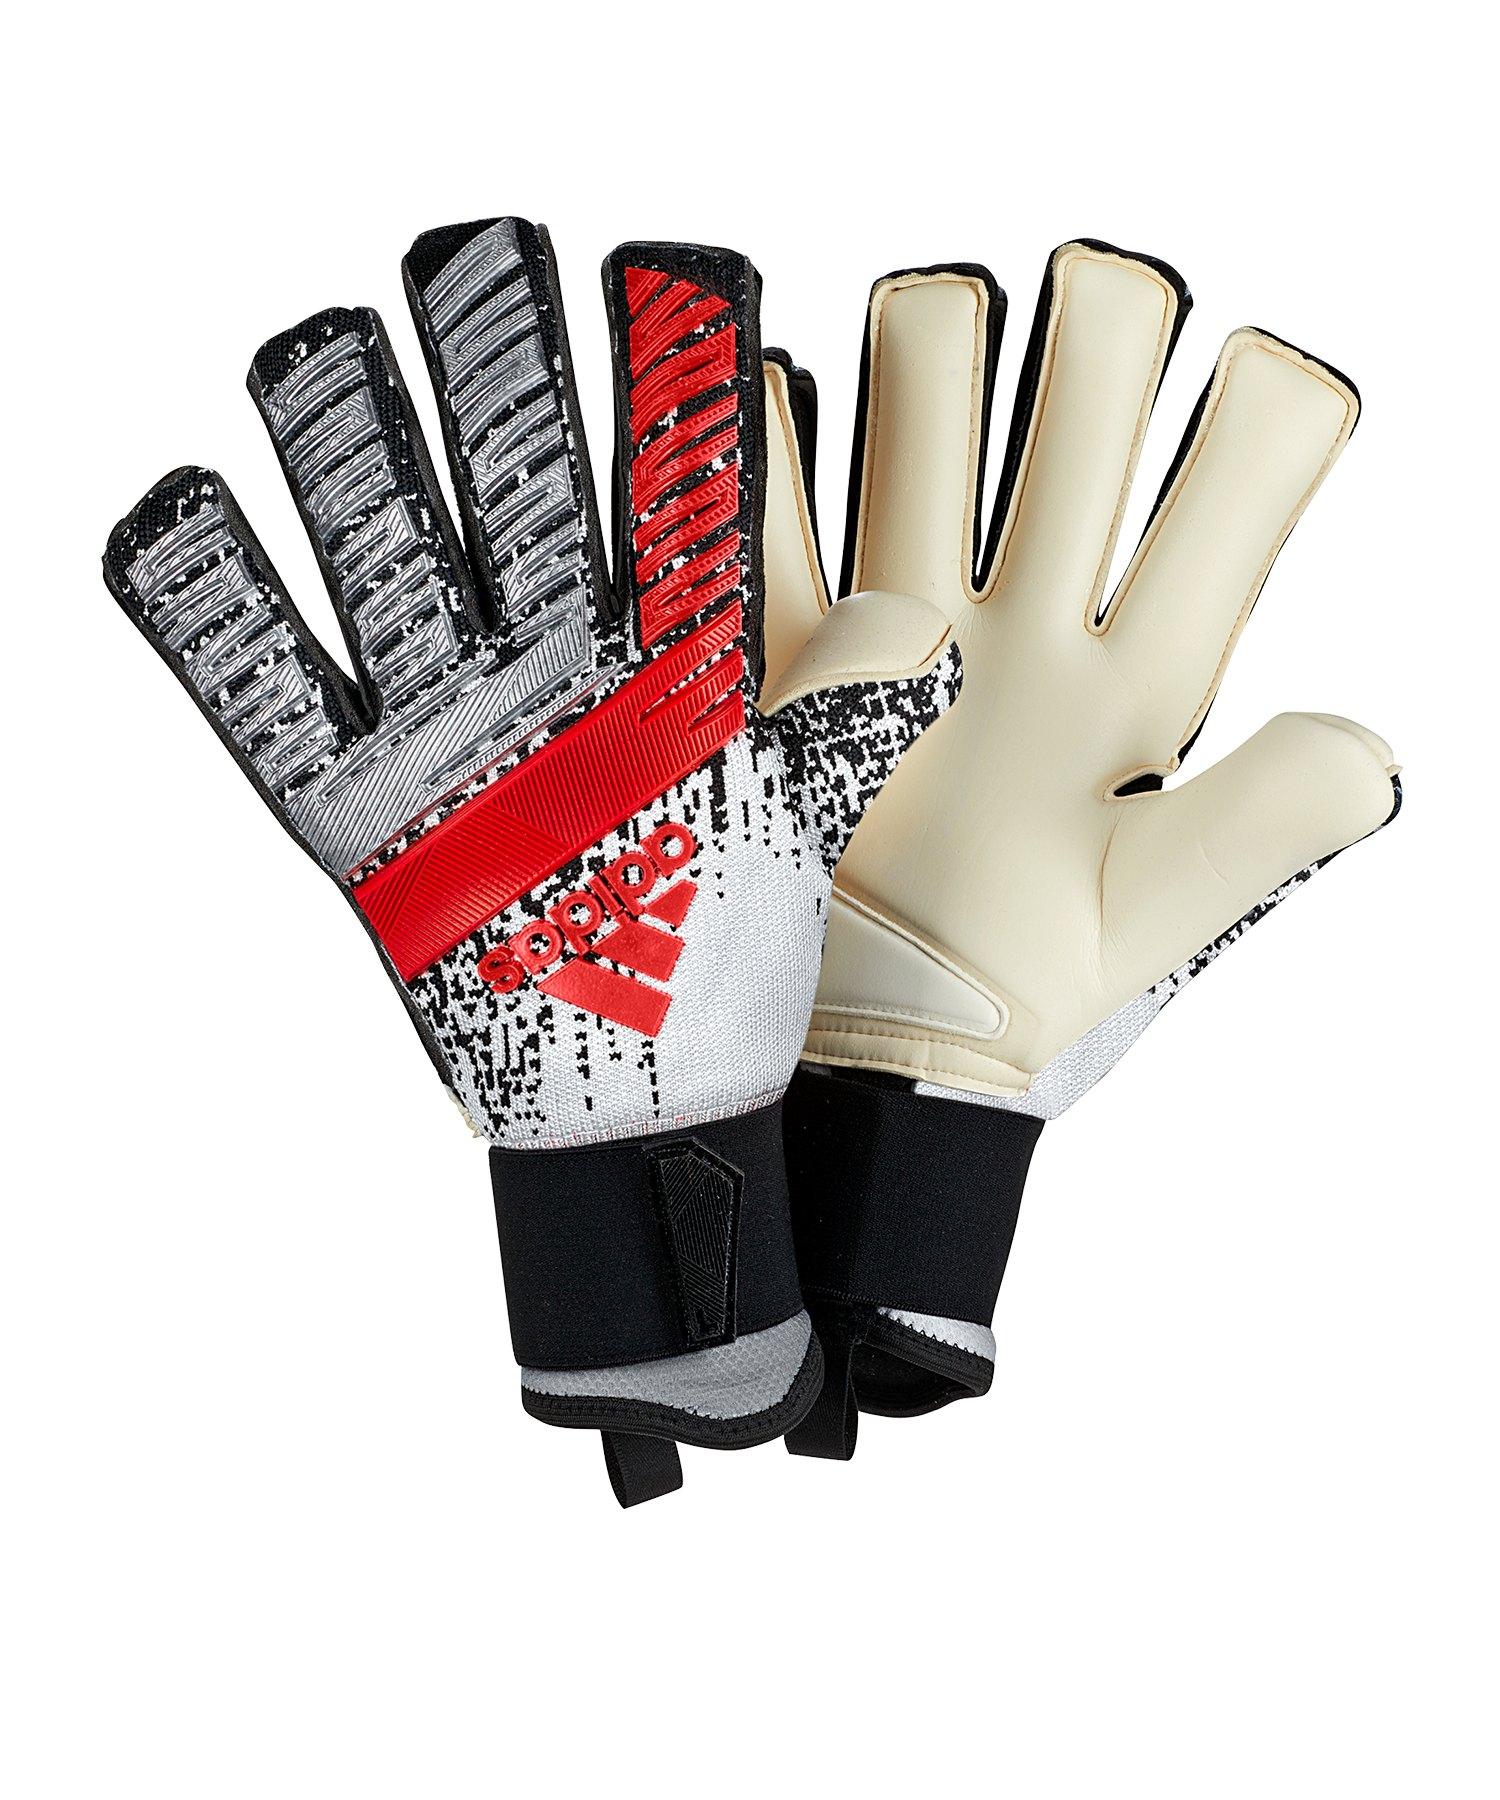 adidas Predator Pro FS TW-Handschuh Silber - silber